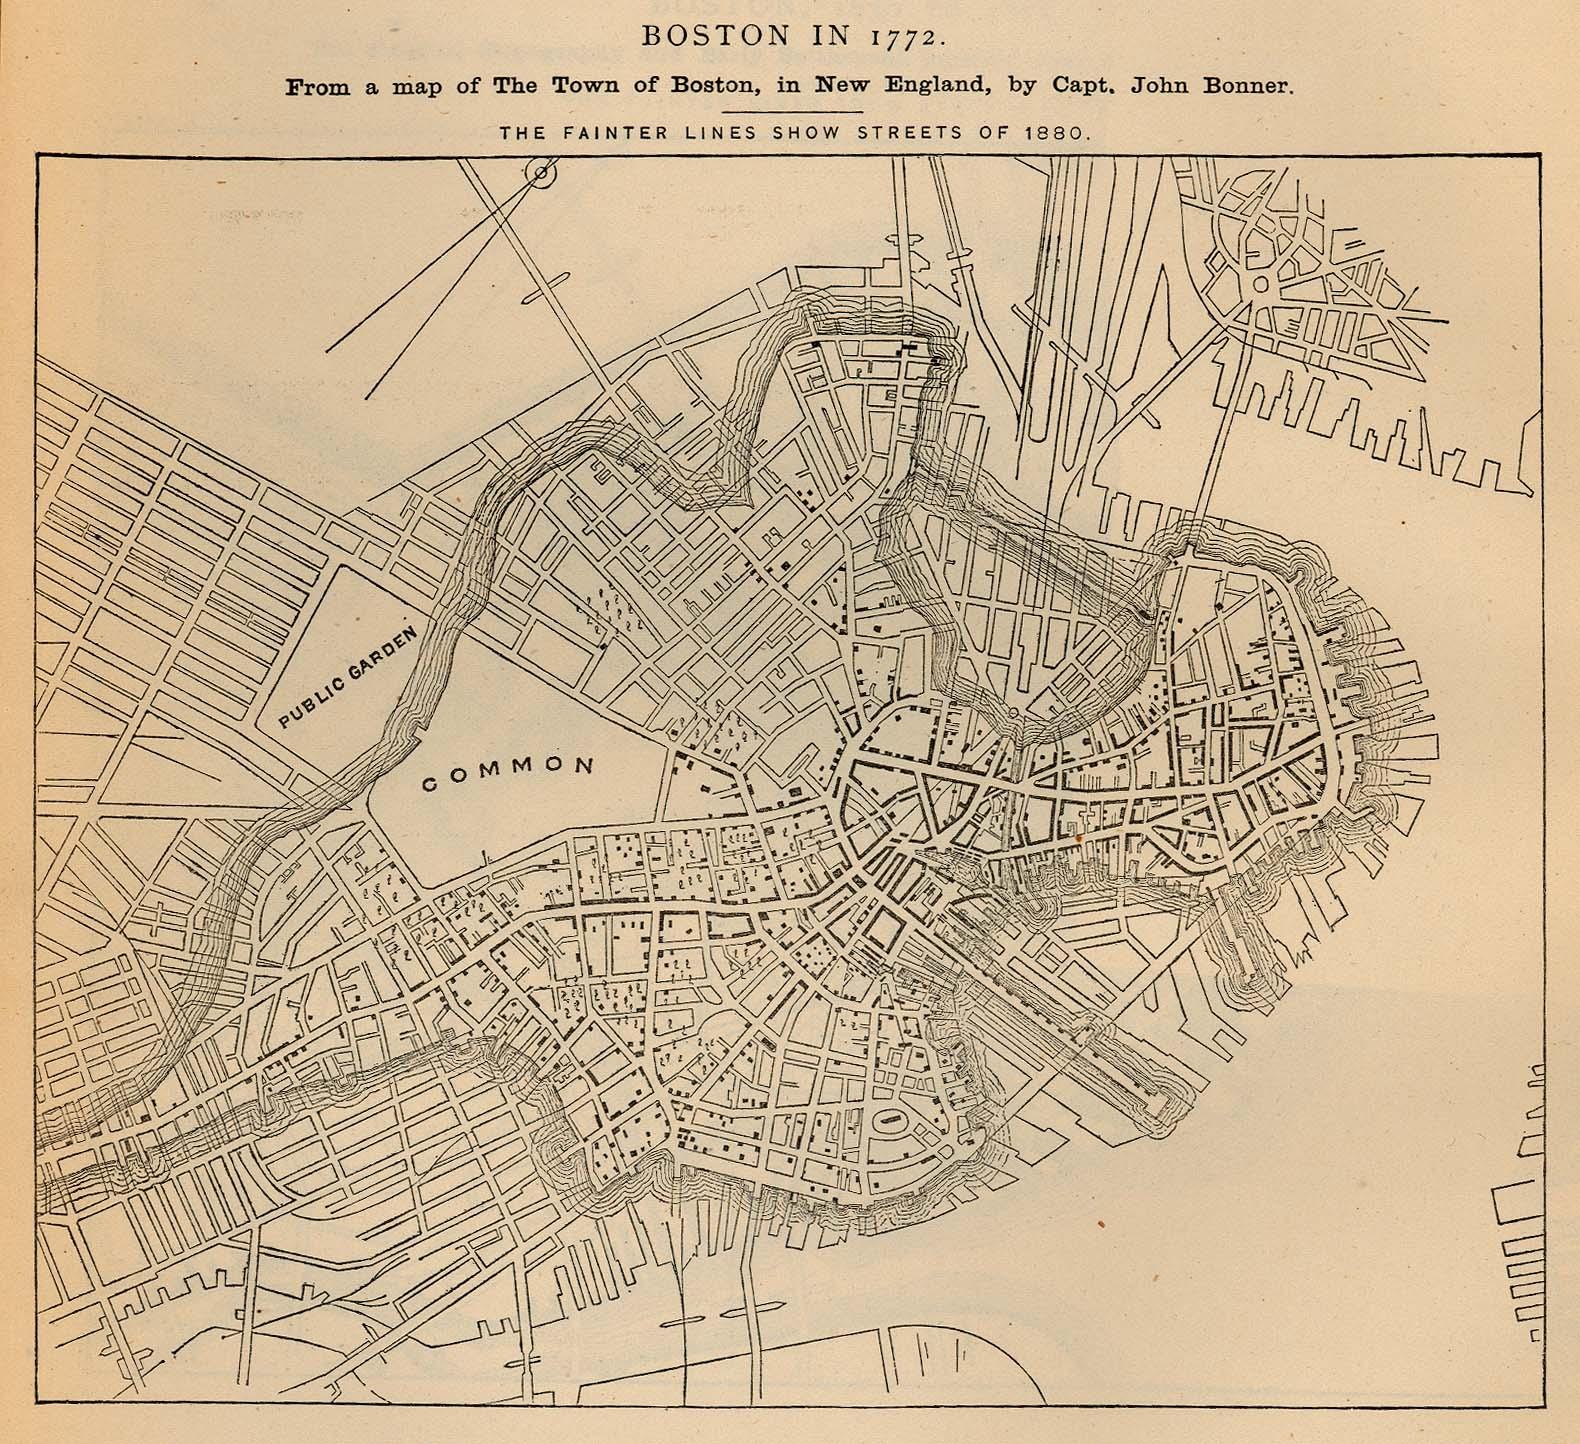 Boston City Map, Massachusetts, United States 1772